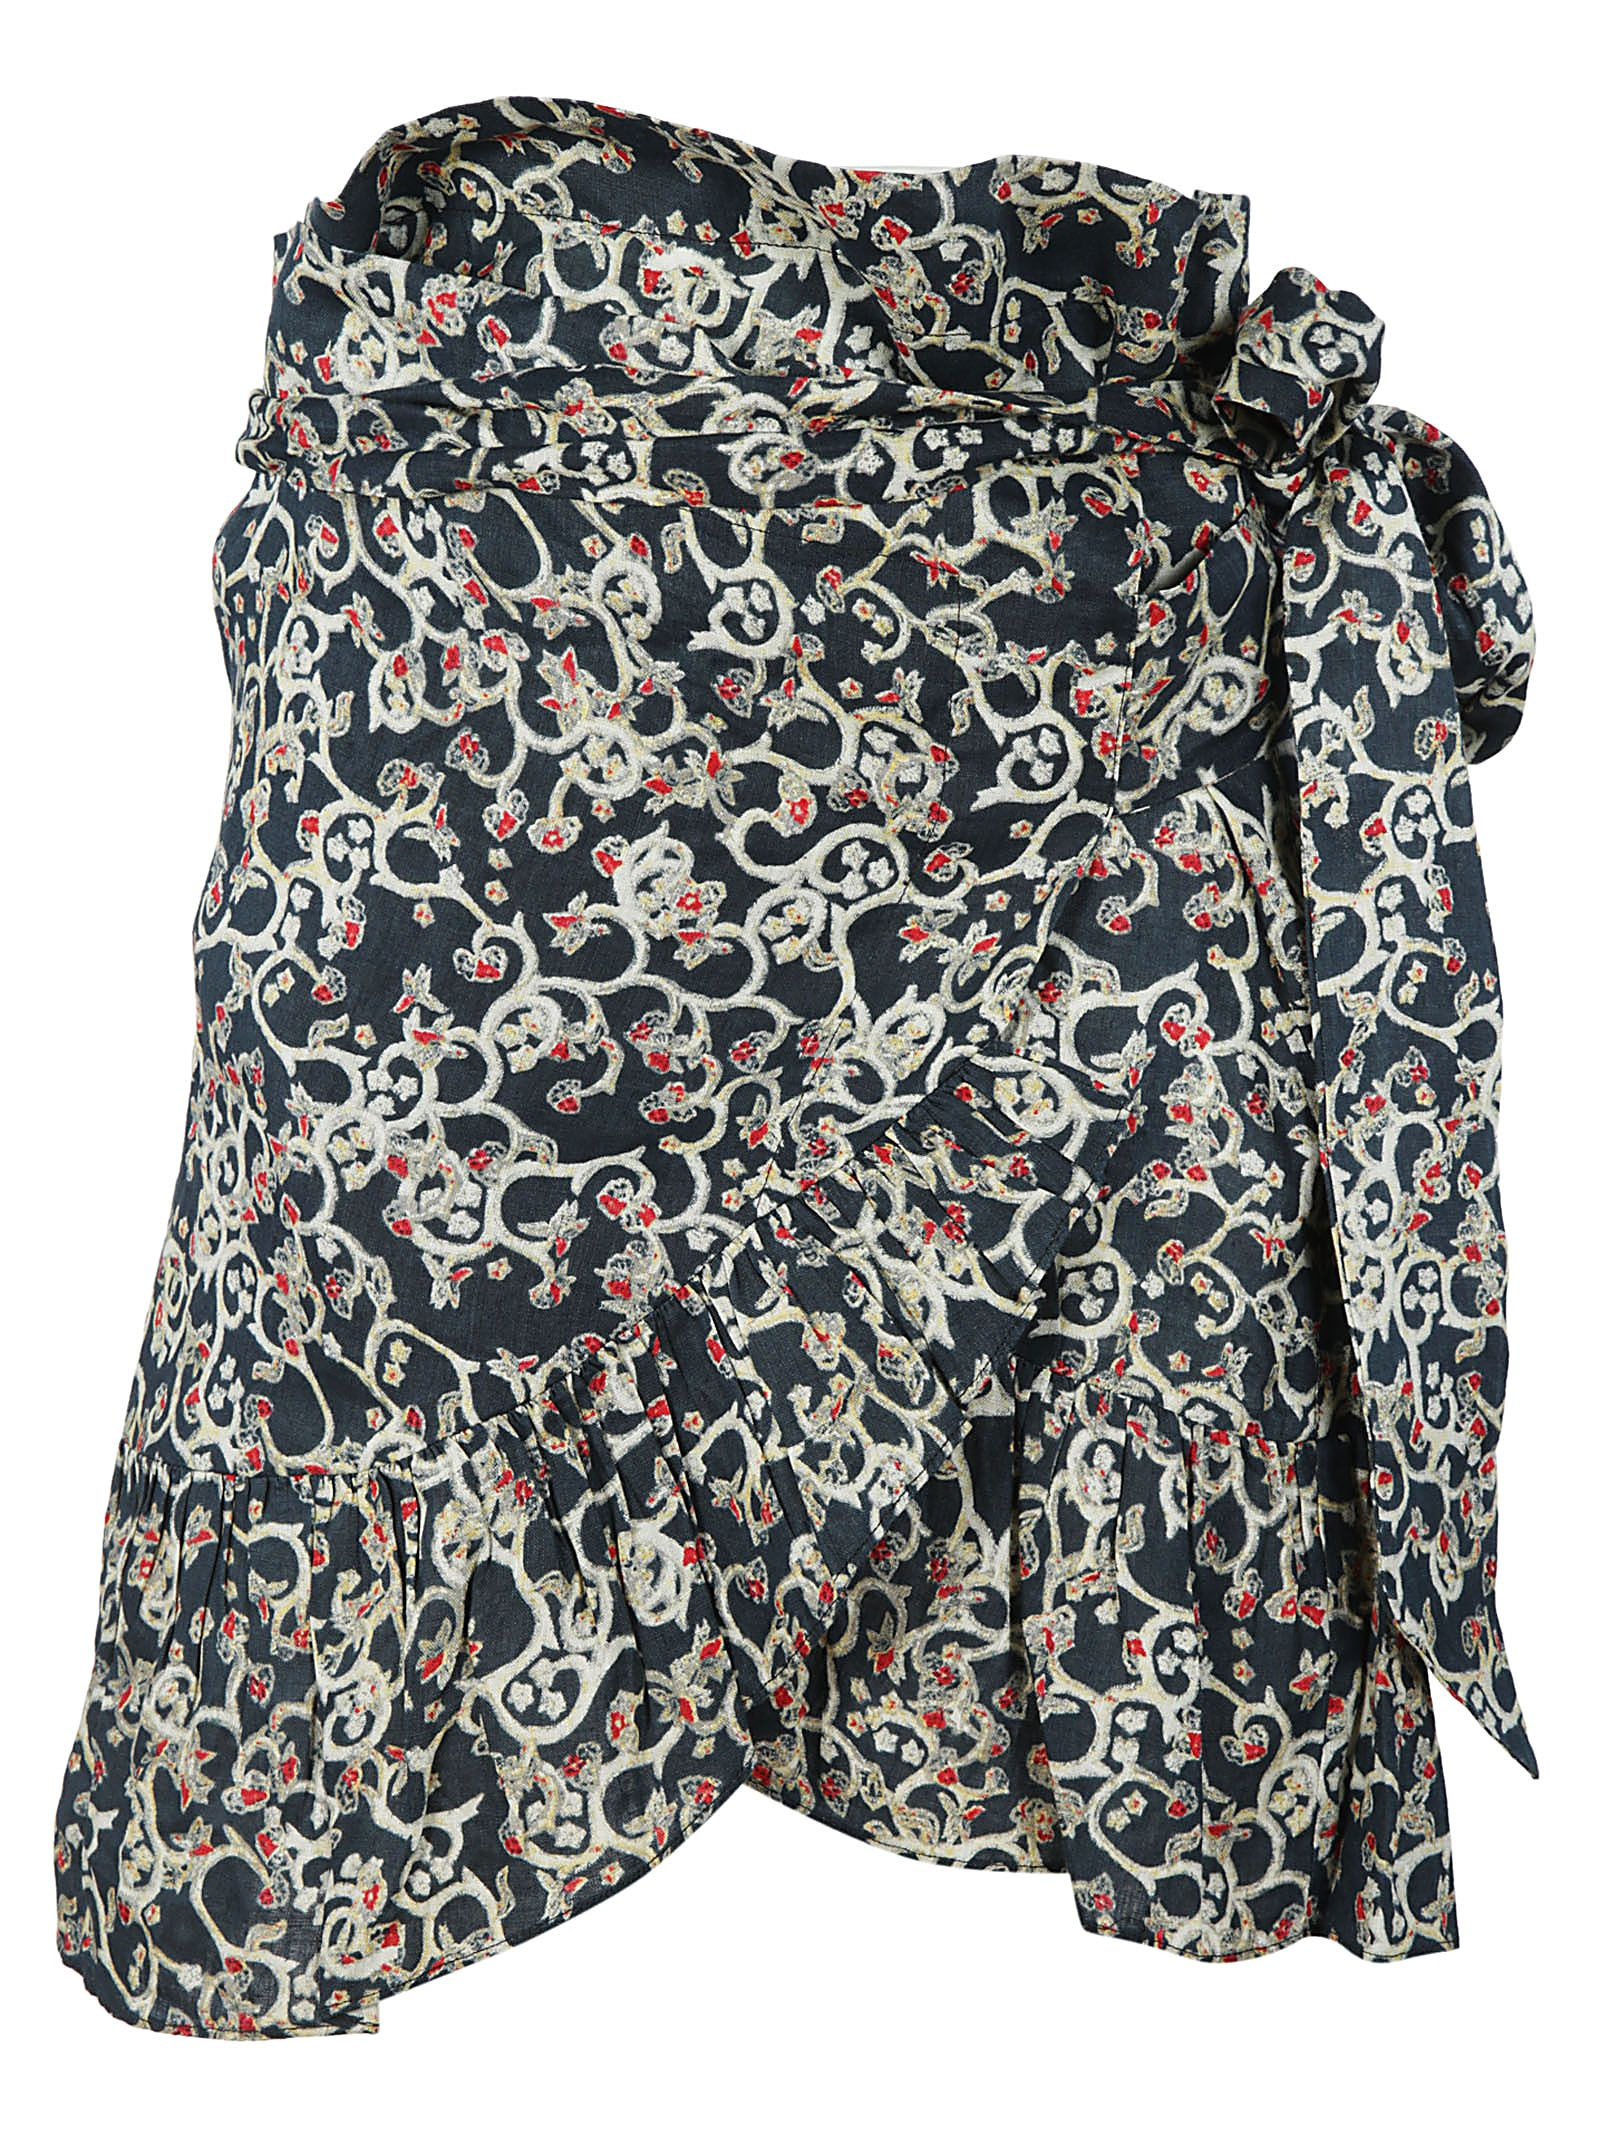 Isabel Marant Mini Wrap Floral Skirt